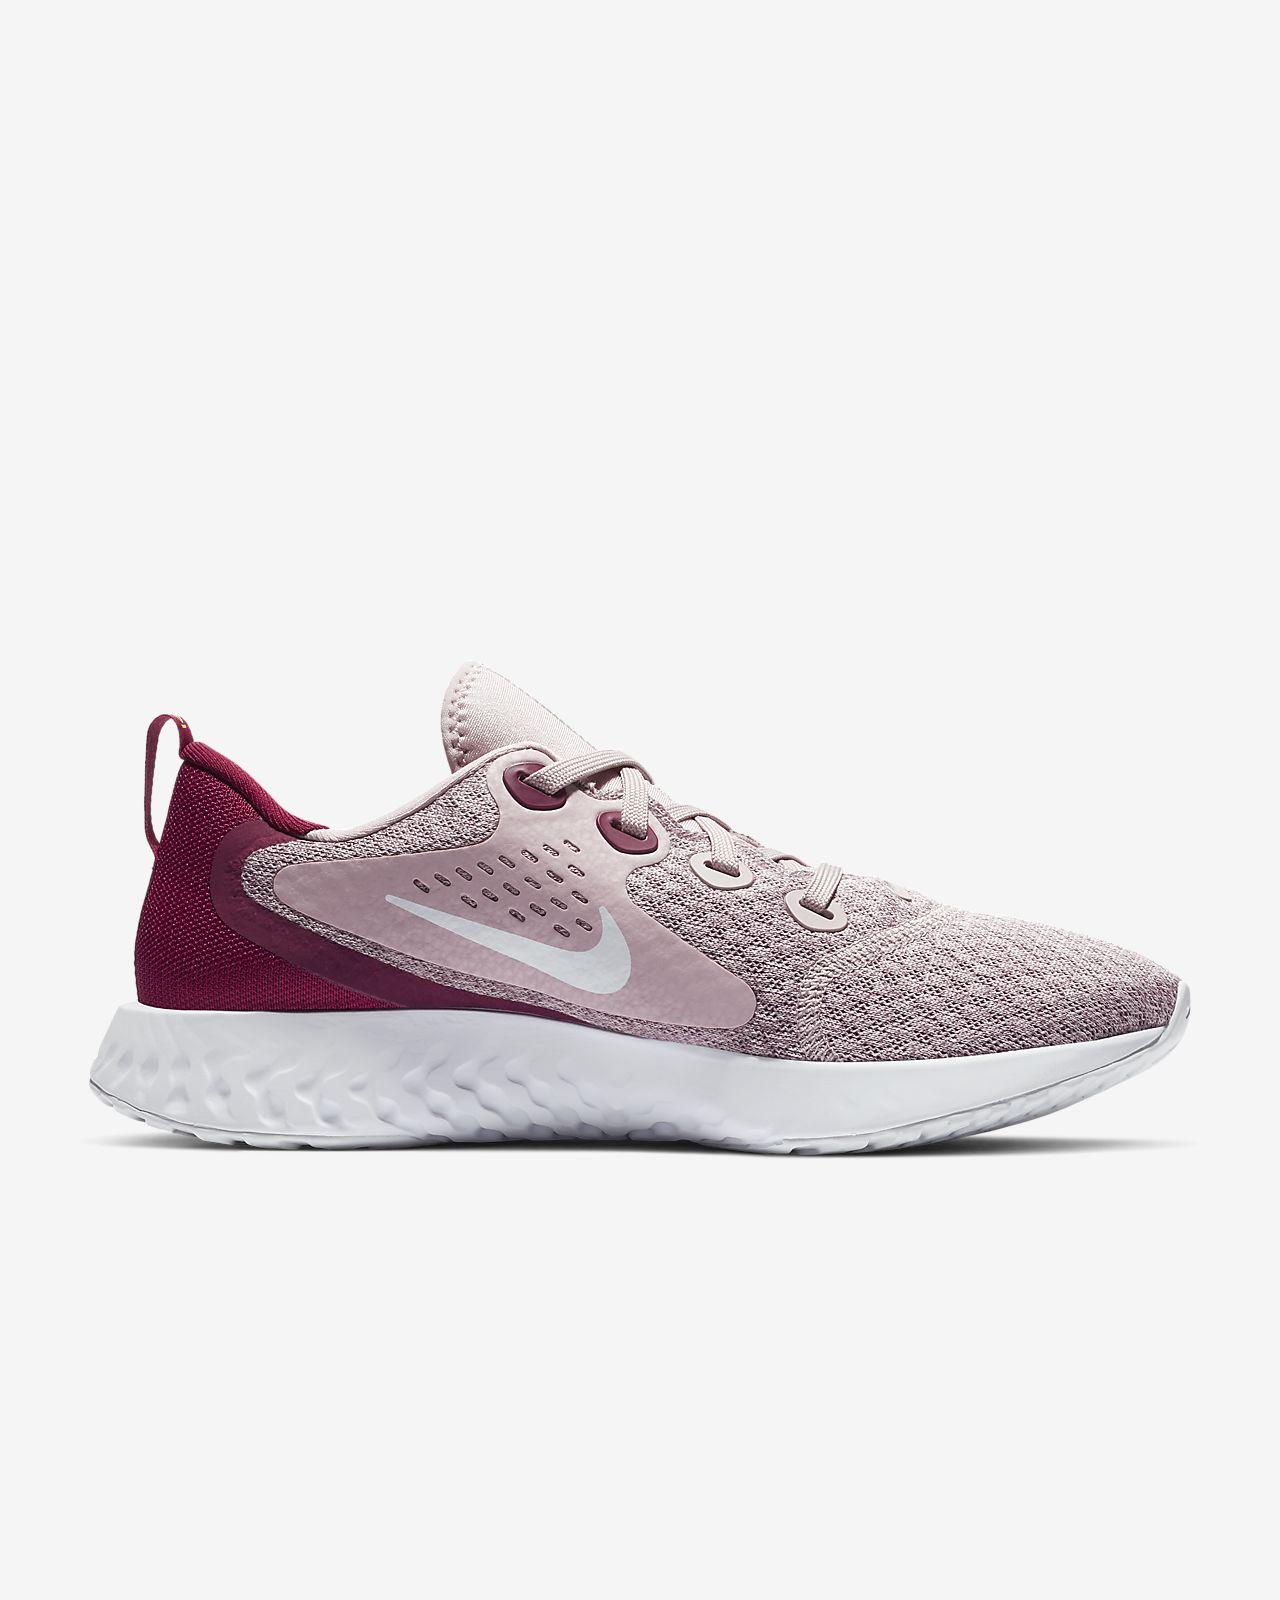 finest selection c7f3a ca05a Women s Running Shoe. Nike Legend React